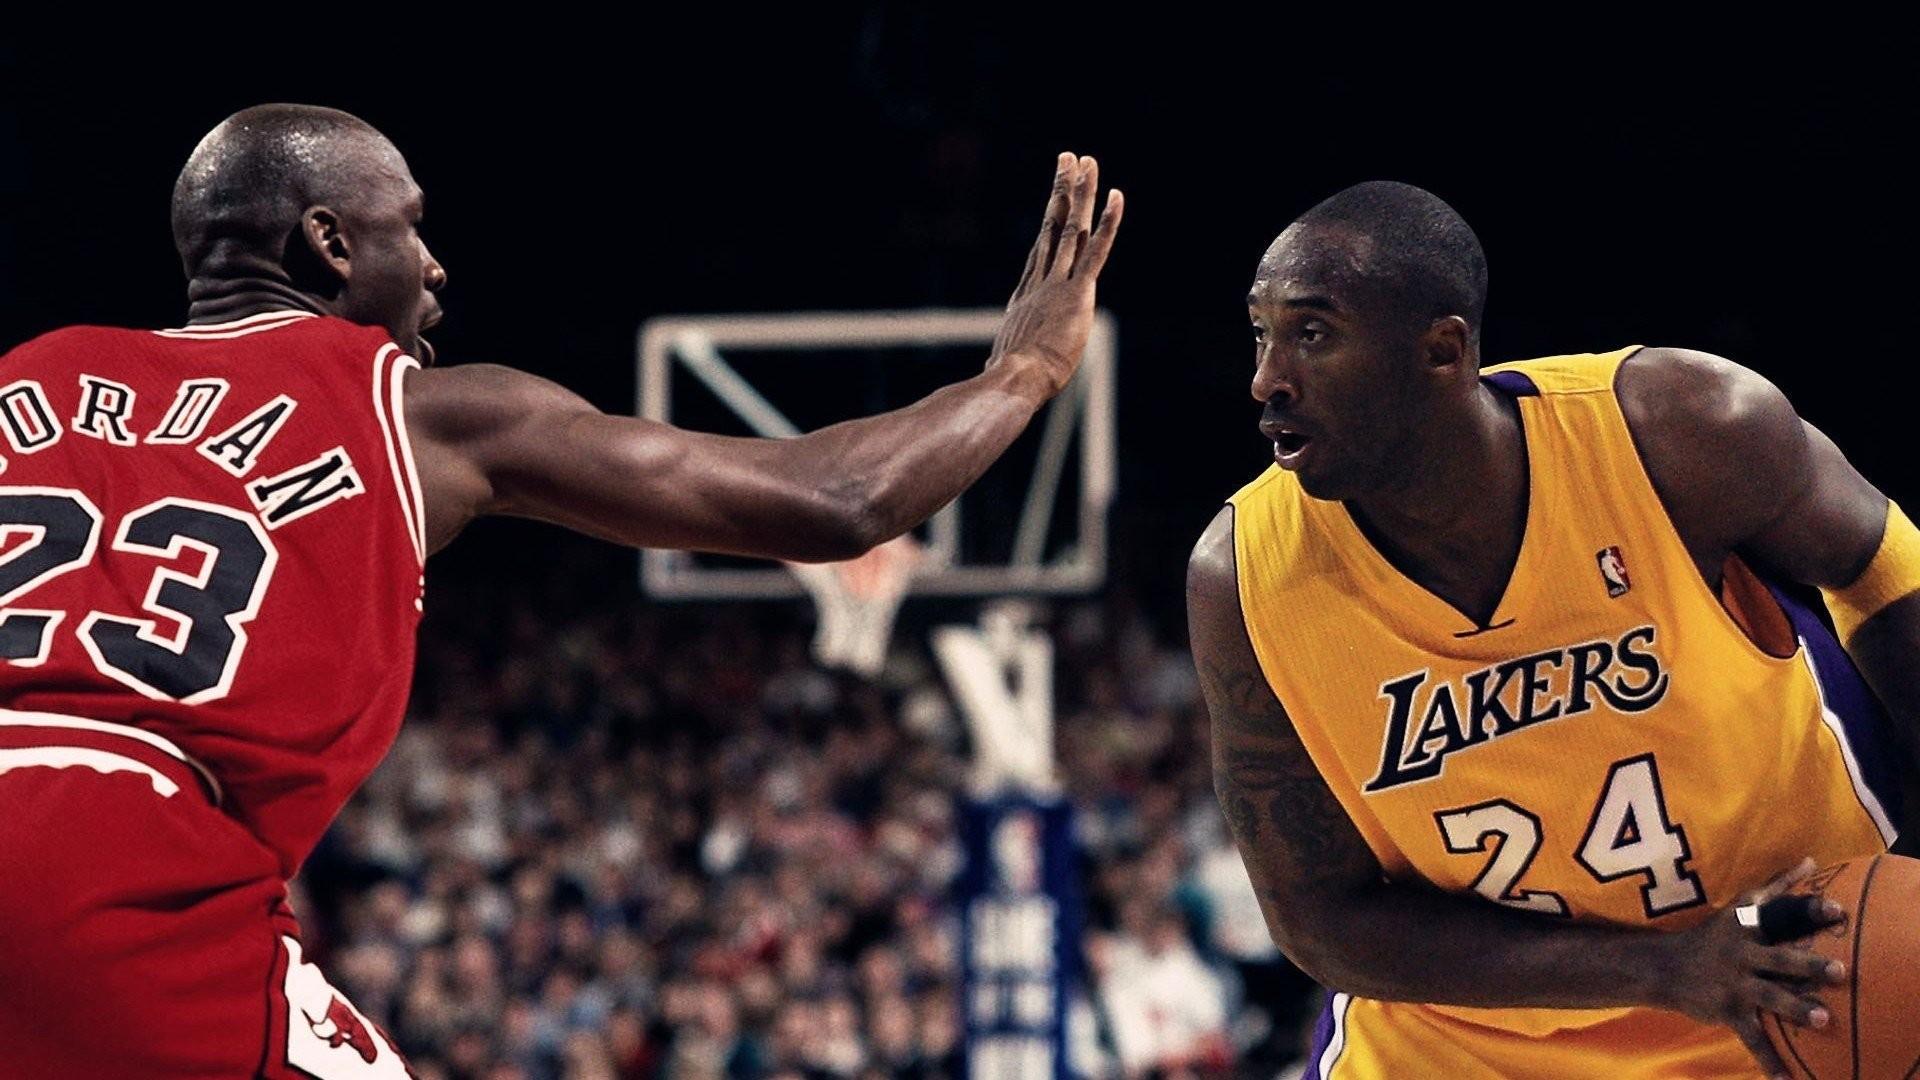 Kobe Vs Jordan Wallpaper Hd Wallpapertag